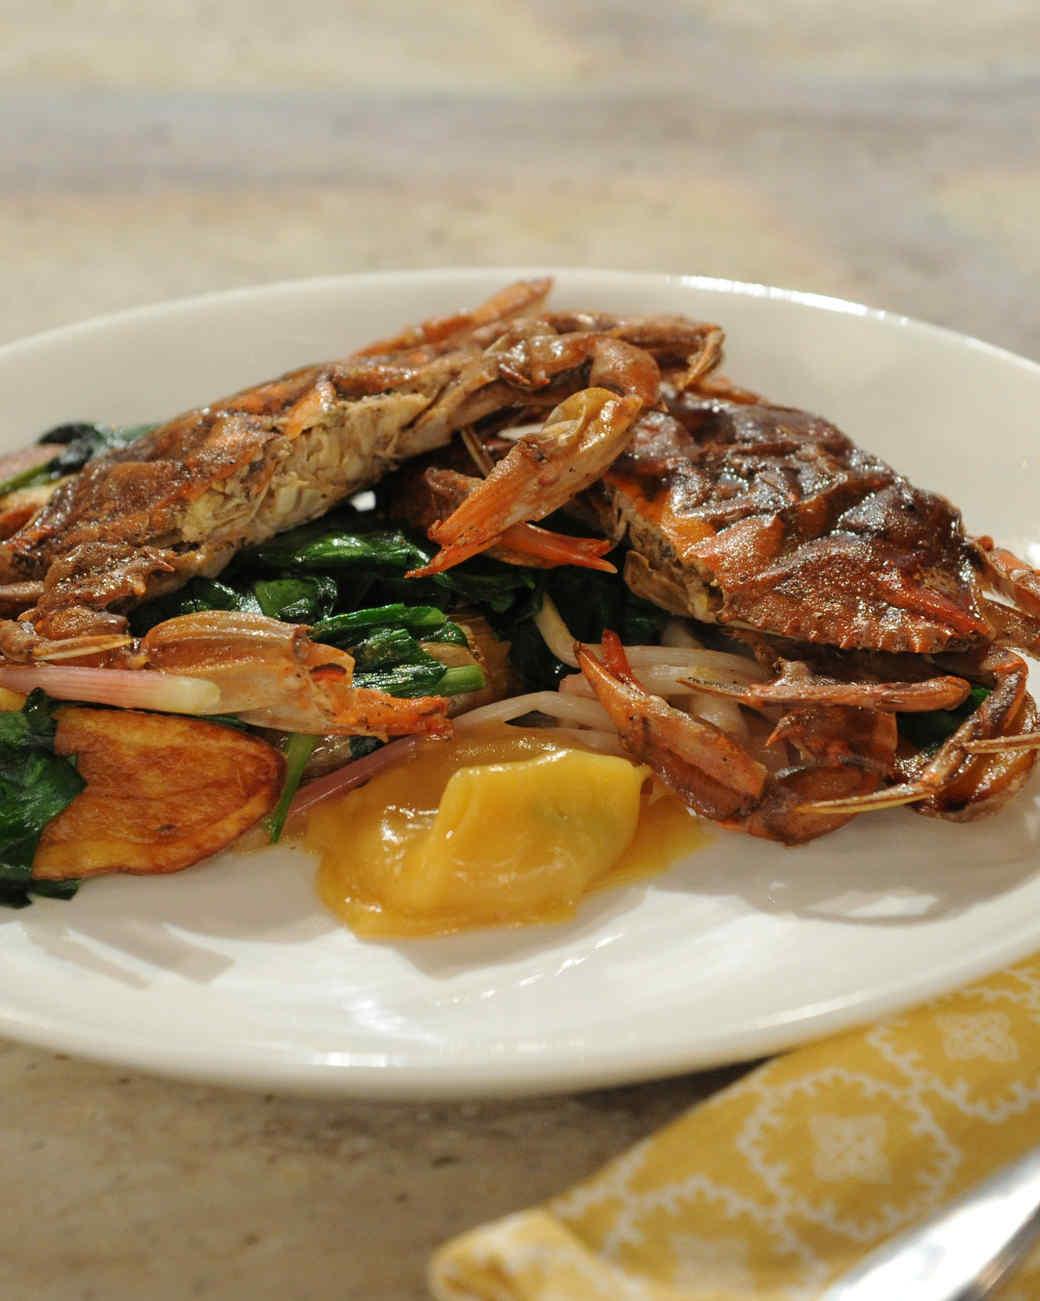 ... , Pickled Ramps, and Lemon Puree Recipe & Video | Martha Stewart